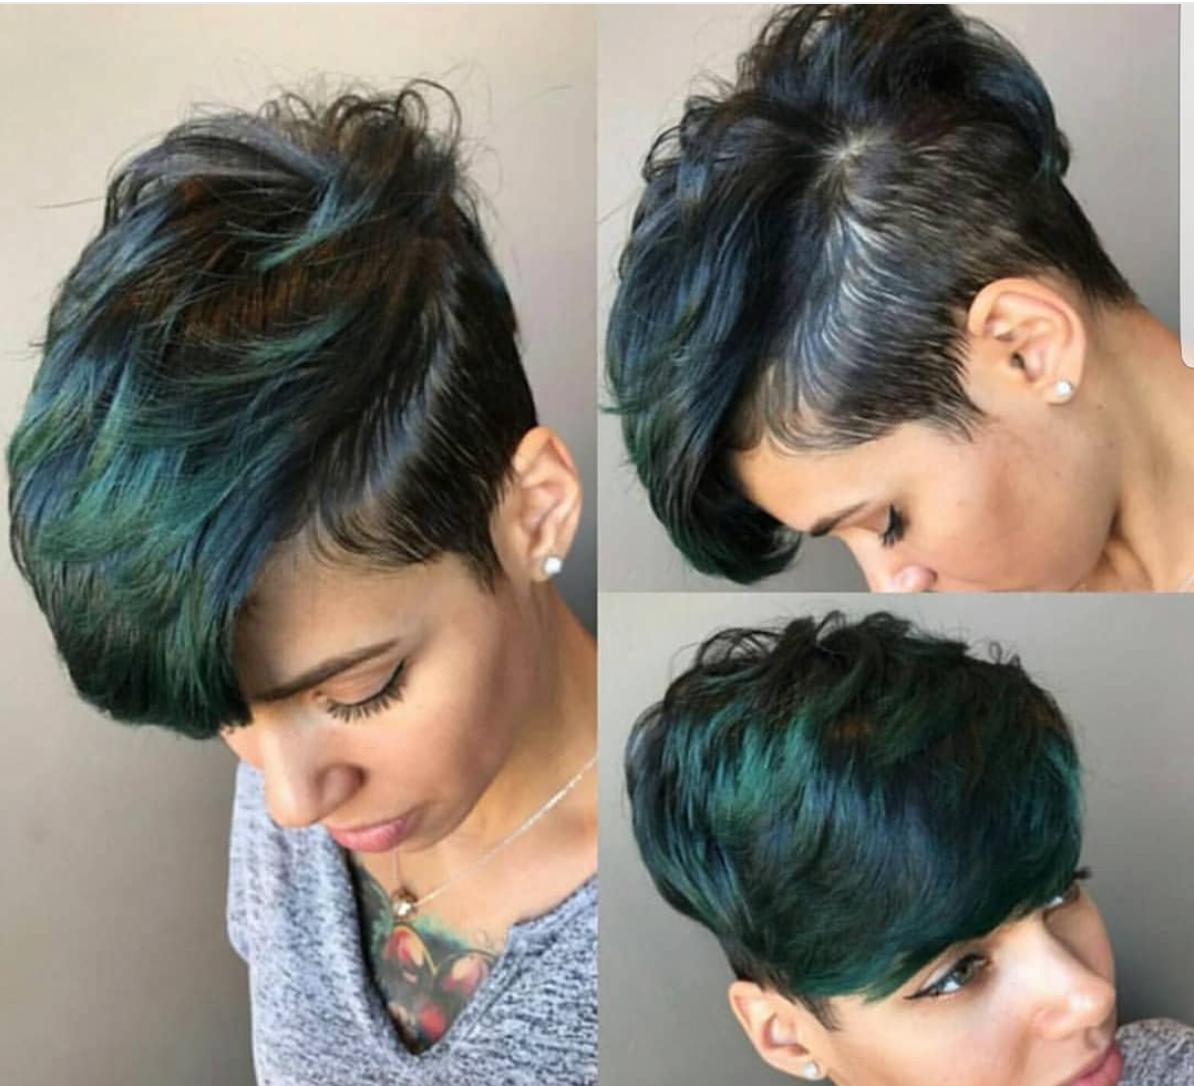 Pin by keary shanice on short hair styles i like in